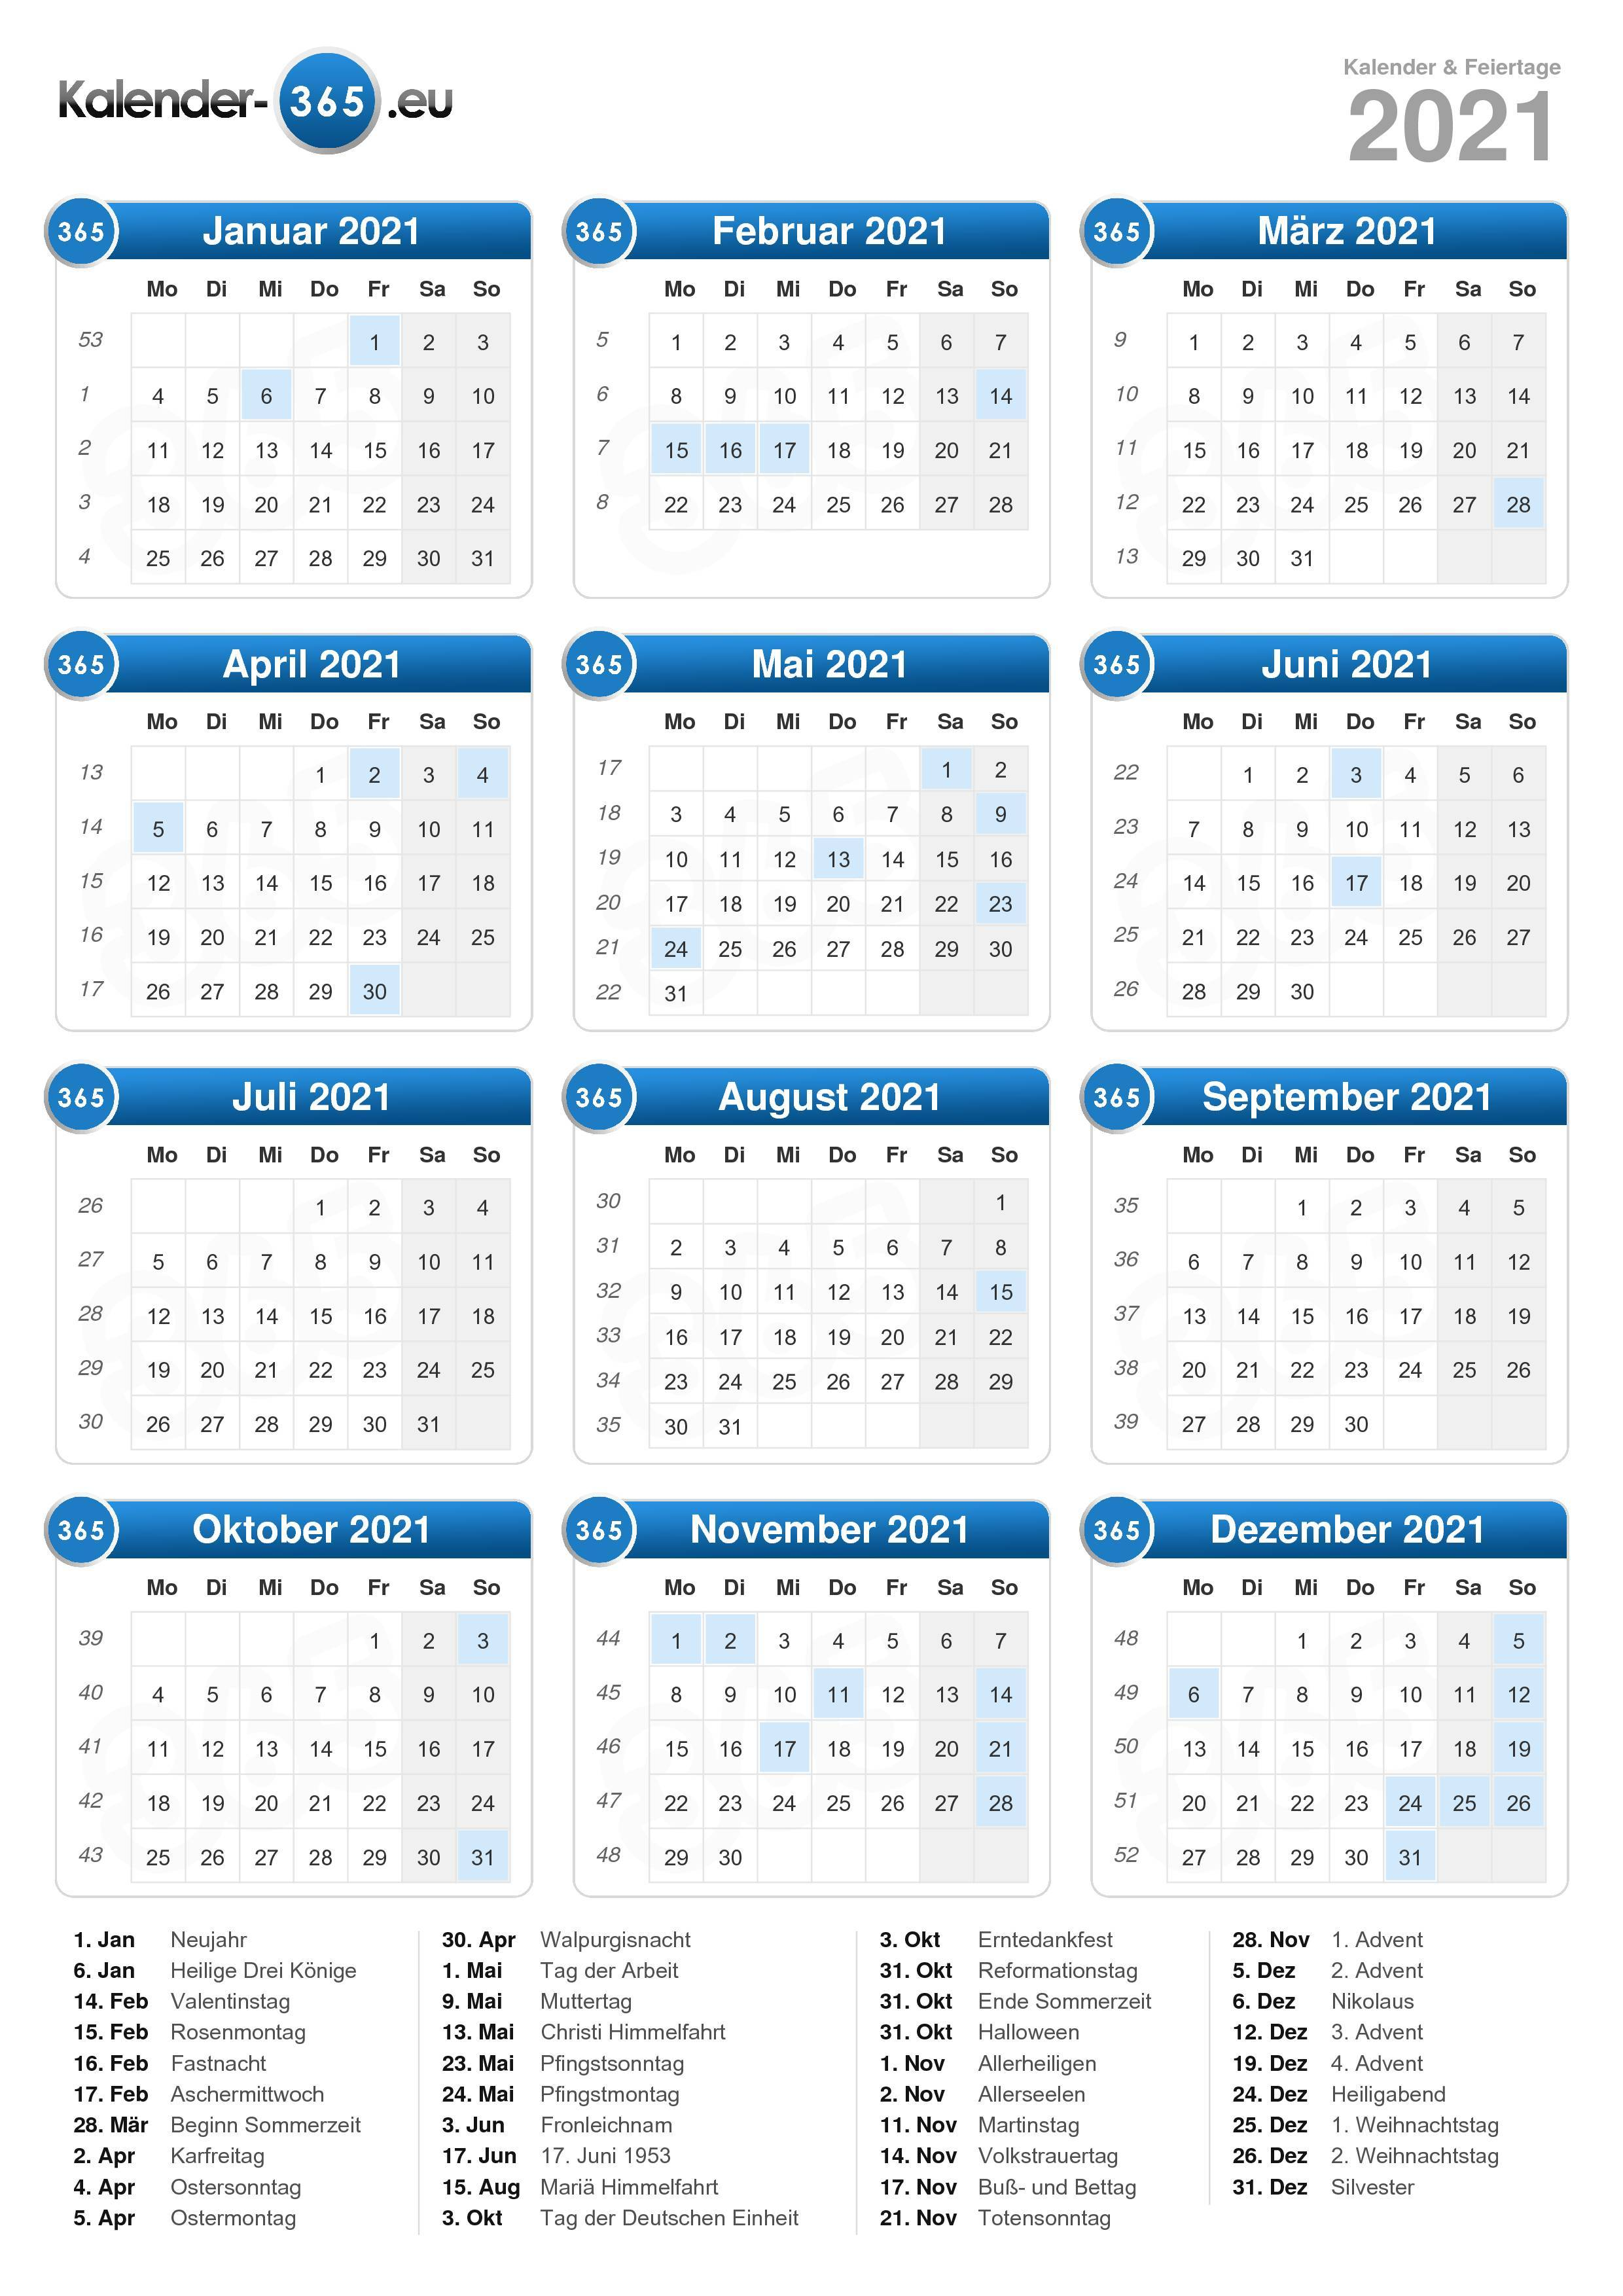 Kalender 2021 for Kalender zum selberbasteln